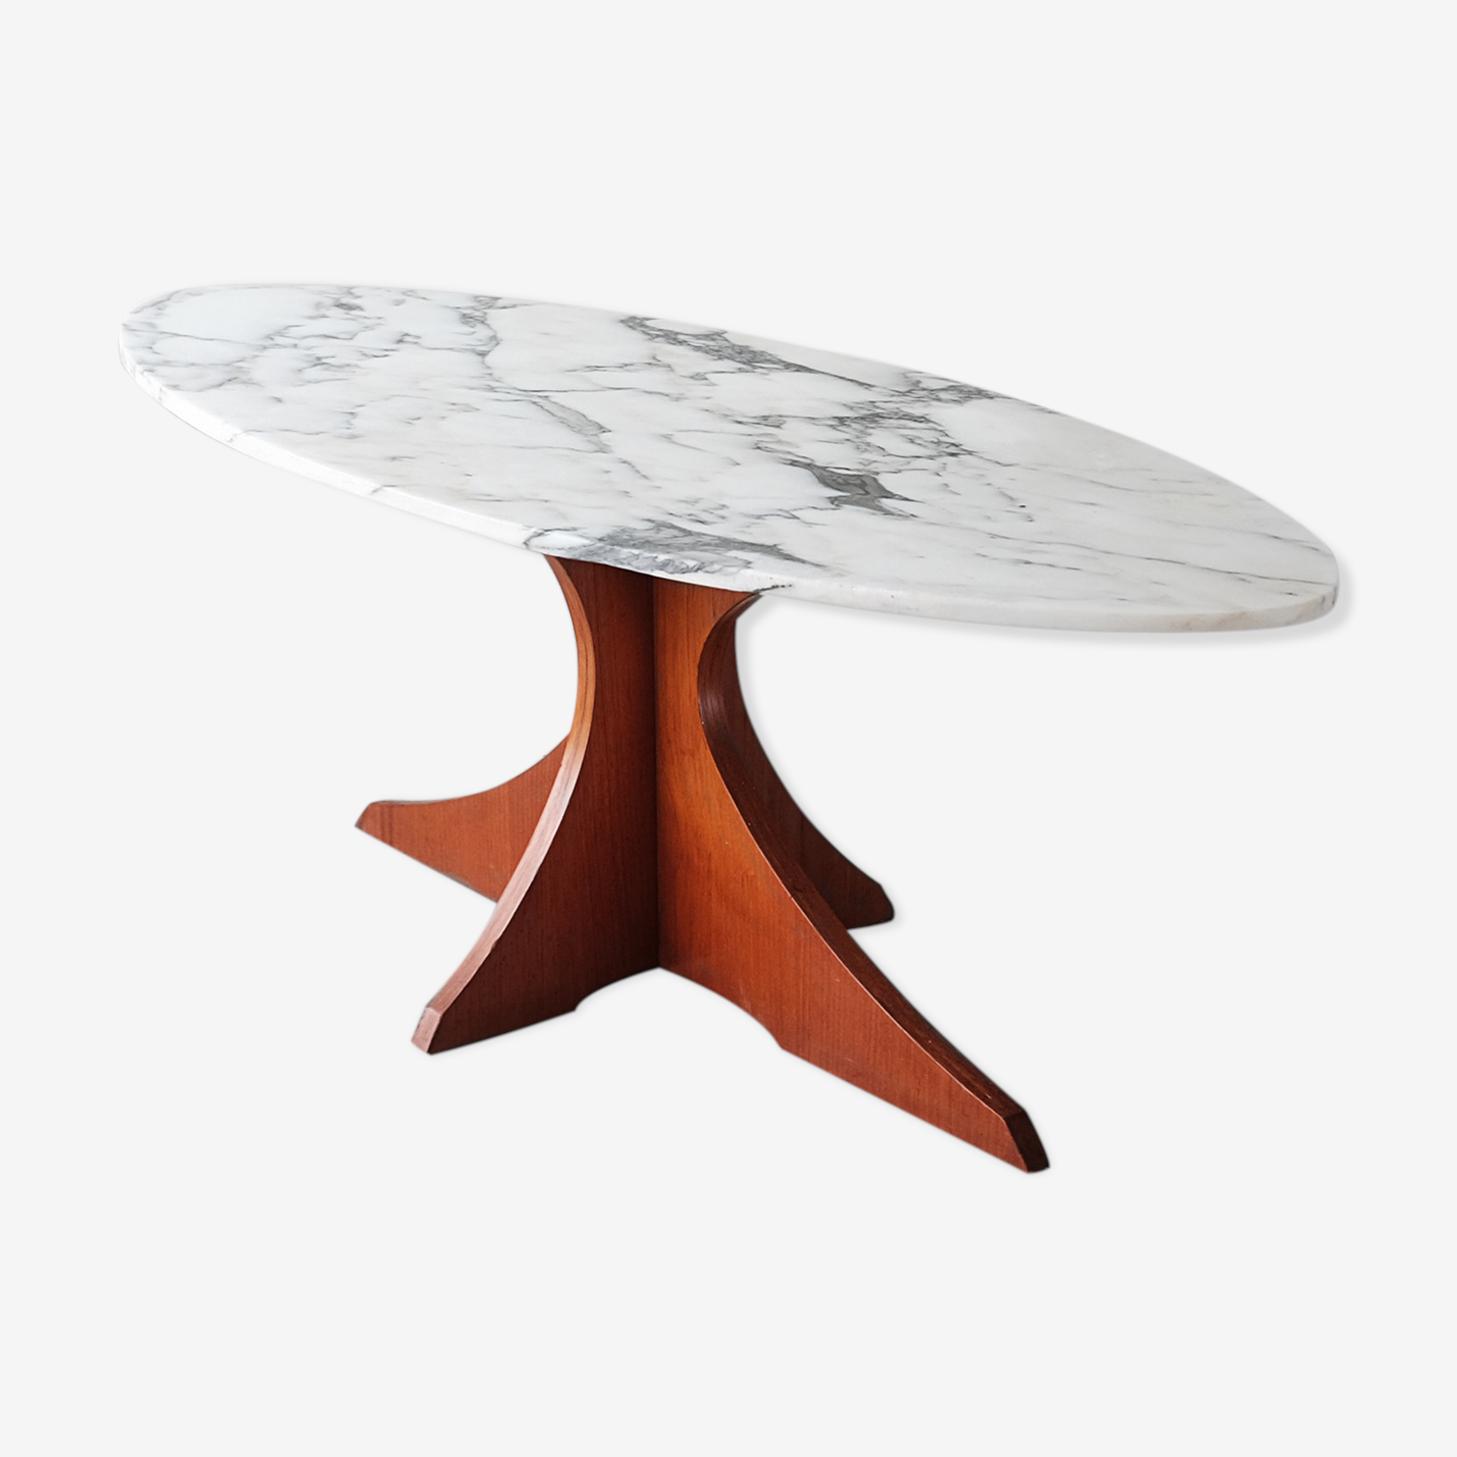 Coffee table wood & marble 60